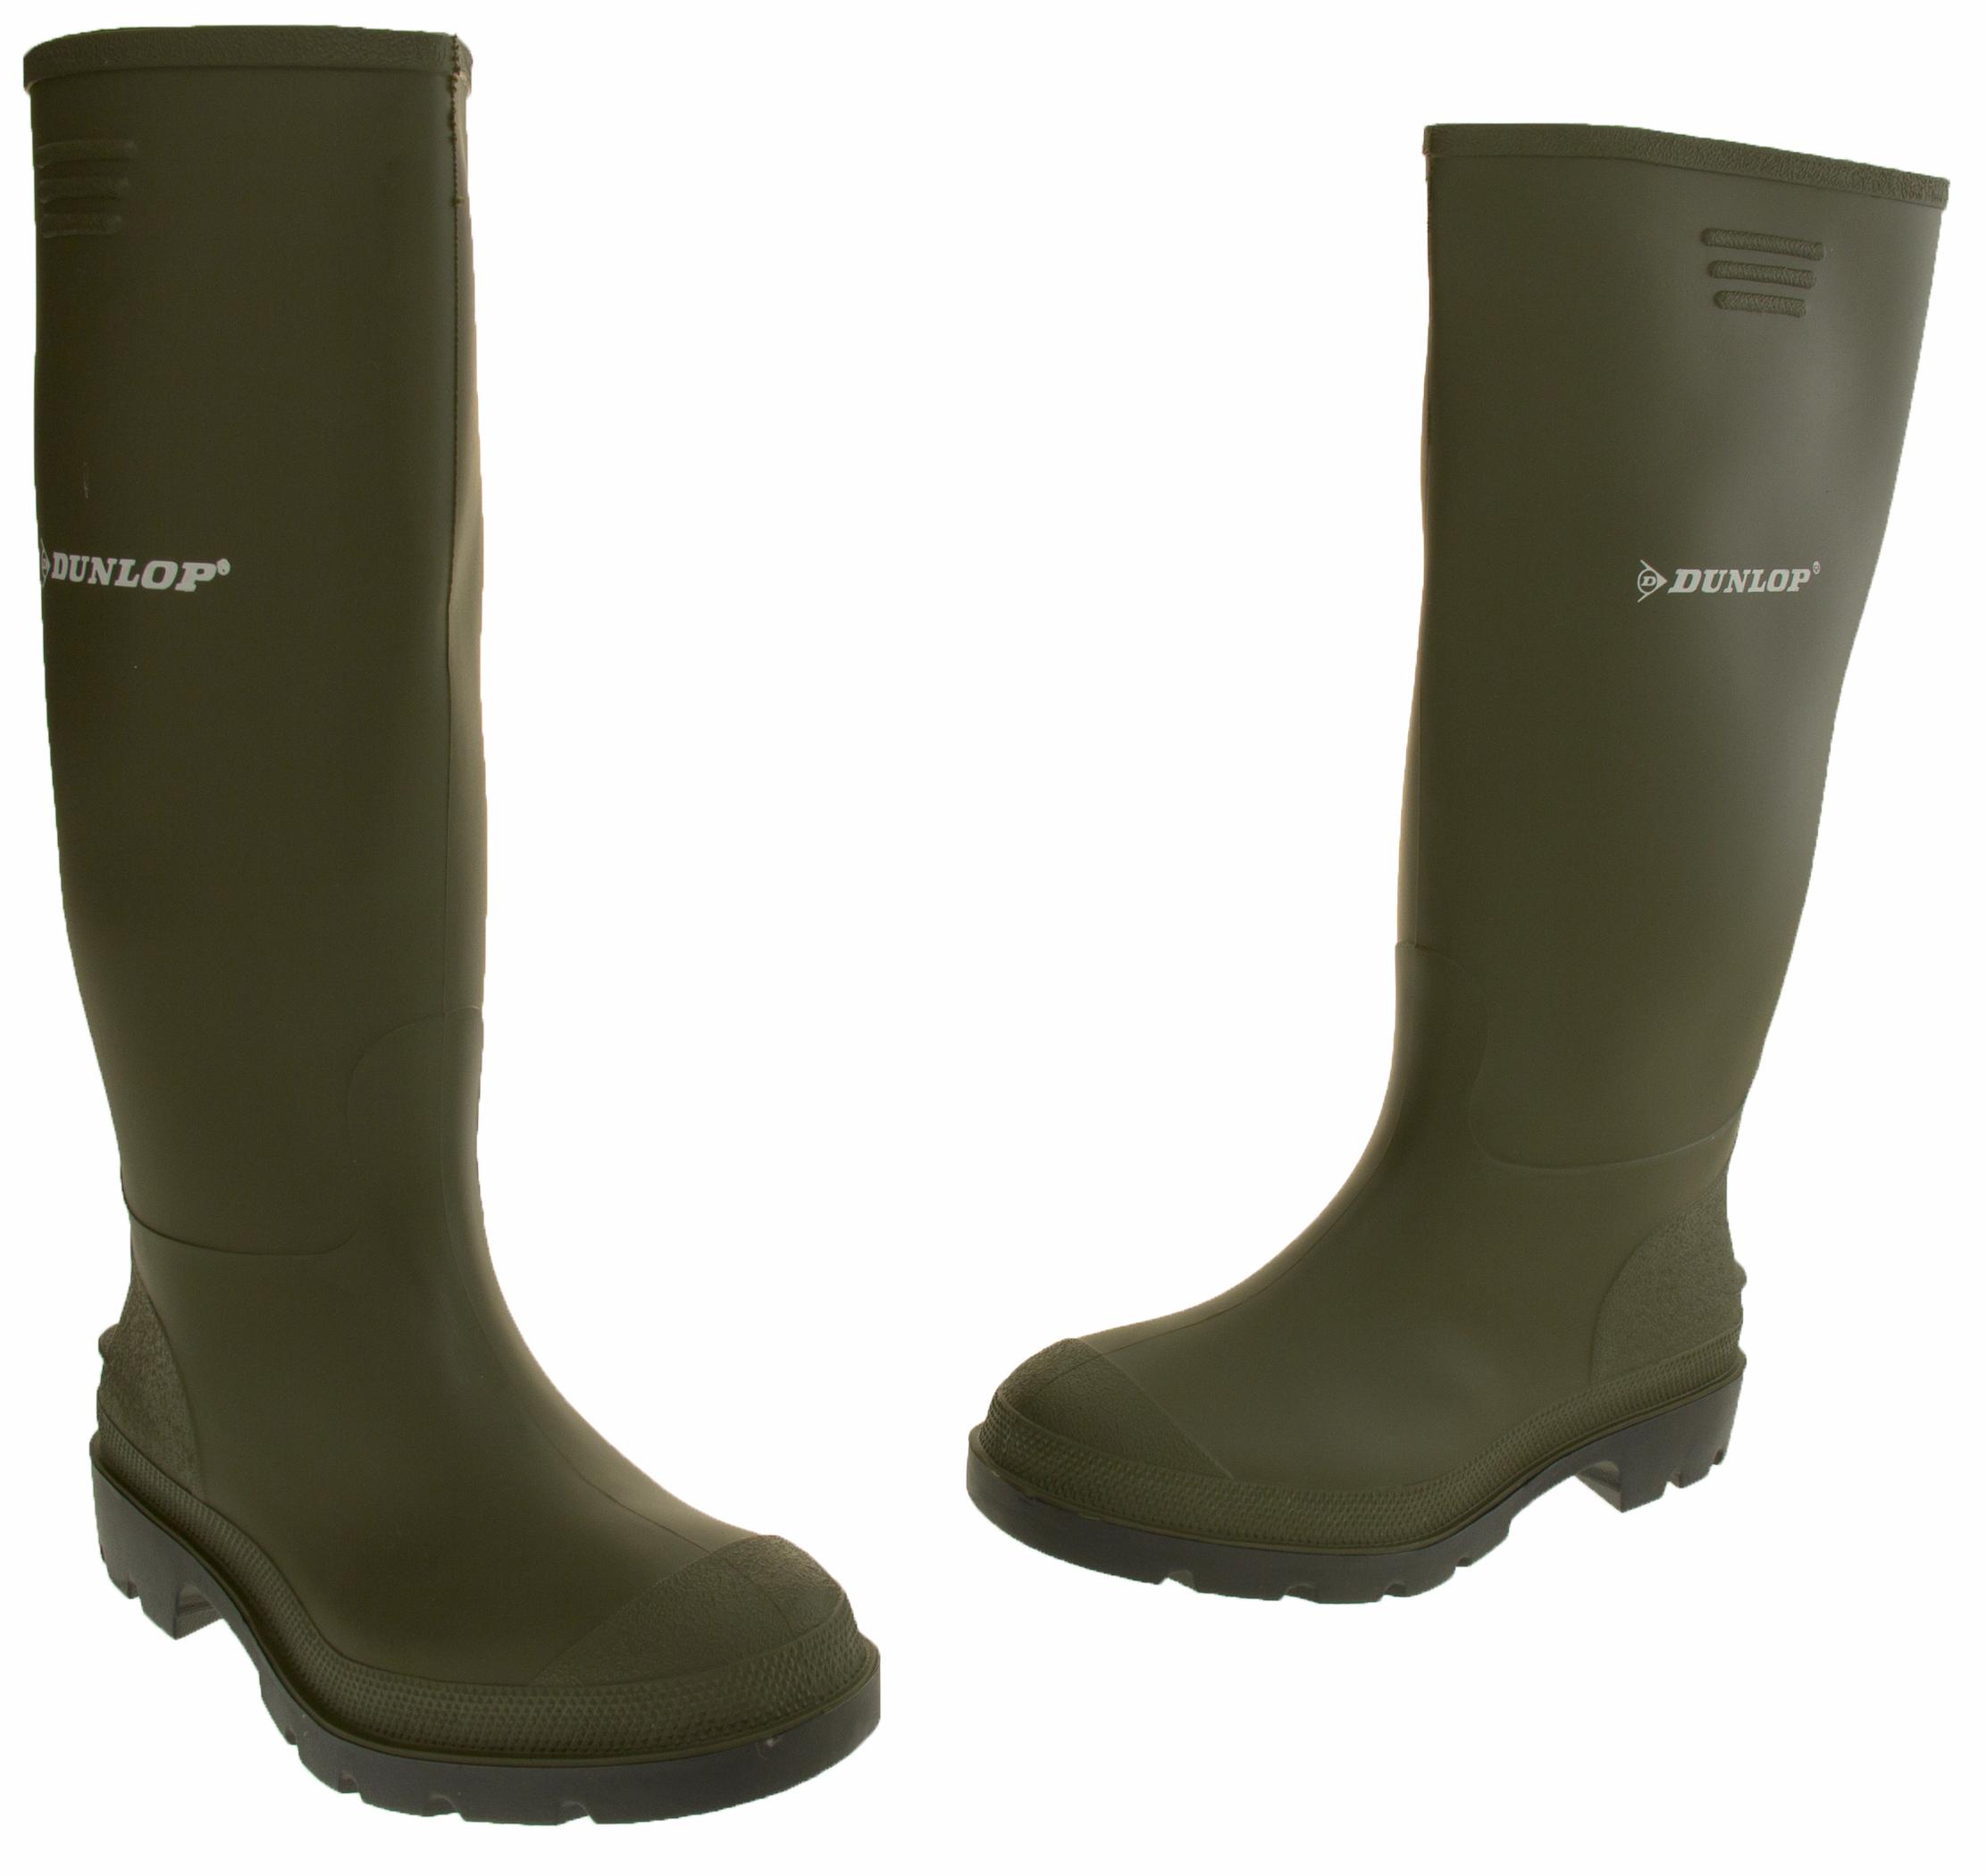 mens dunlop wellington boots waterproof wellies welly boot